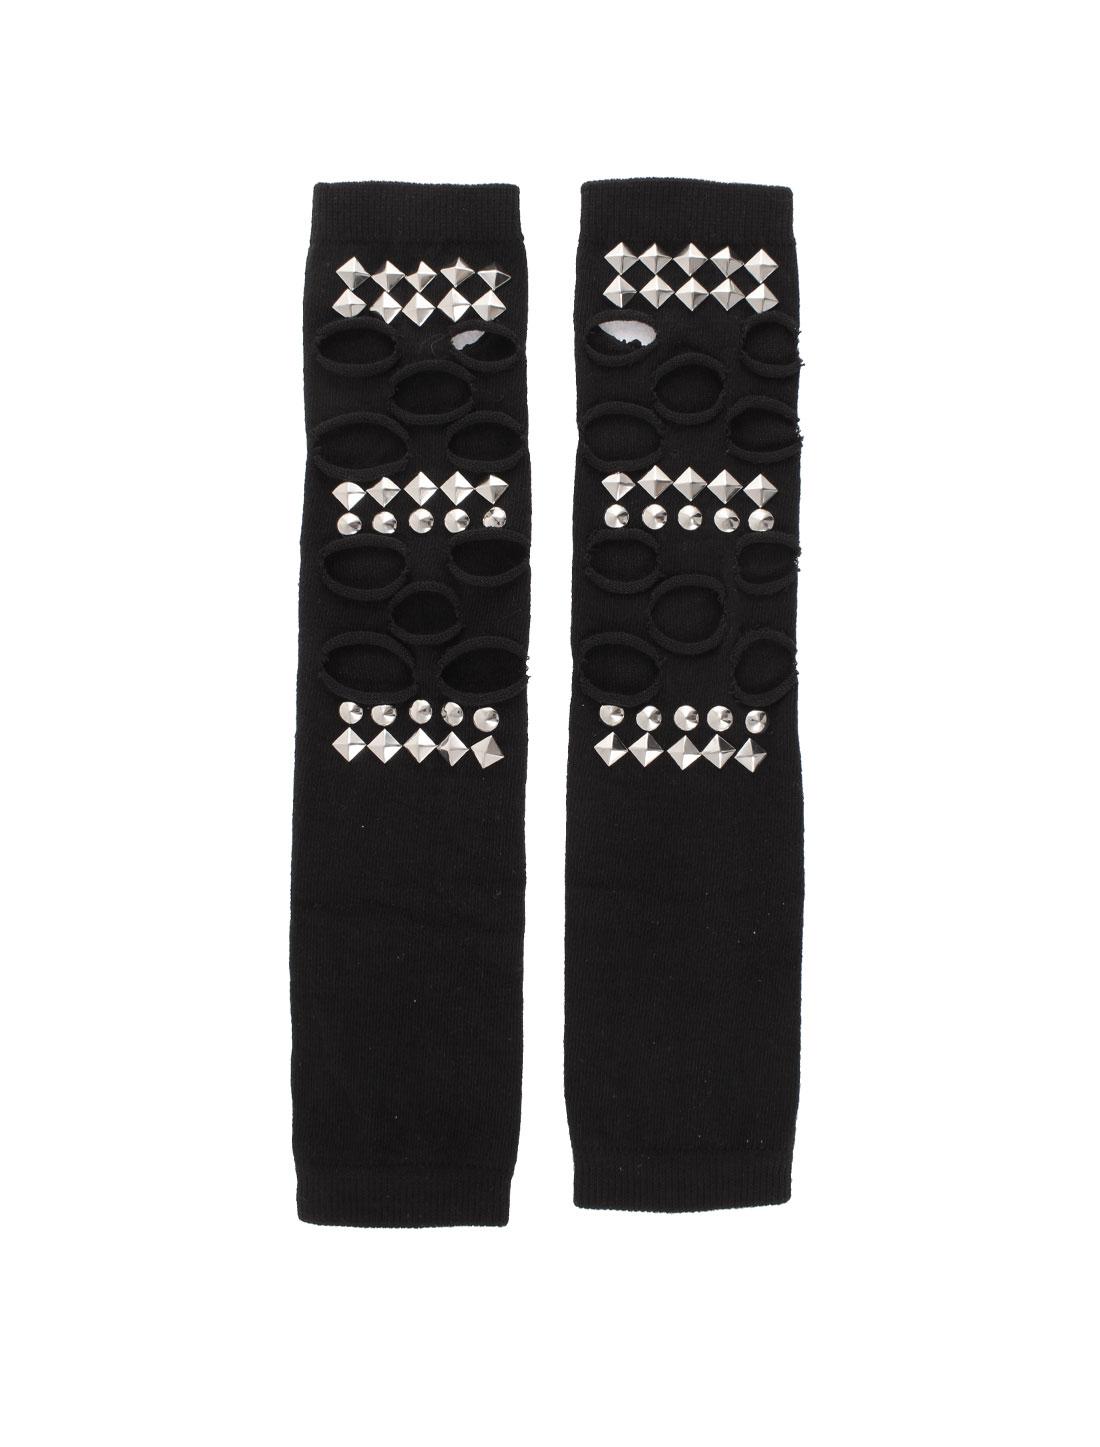 Women Shiny Rivets Decoration Elastic Fingerless Arm Warmer Sleeve Gloves Black Pair